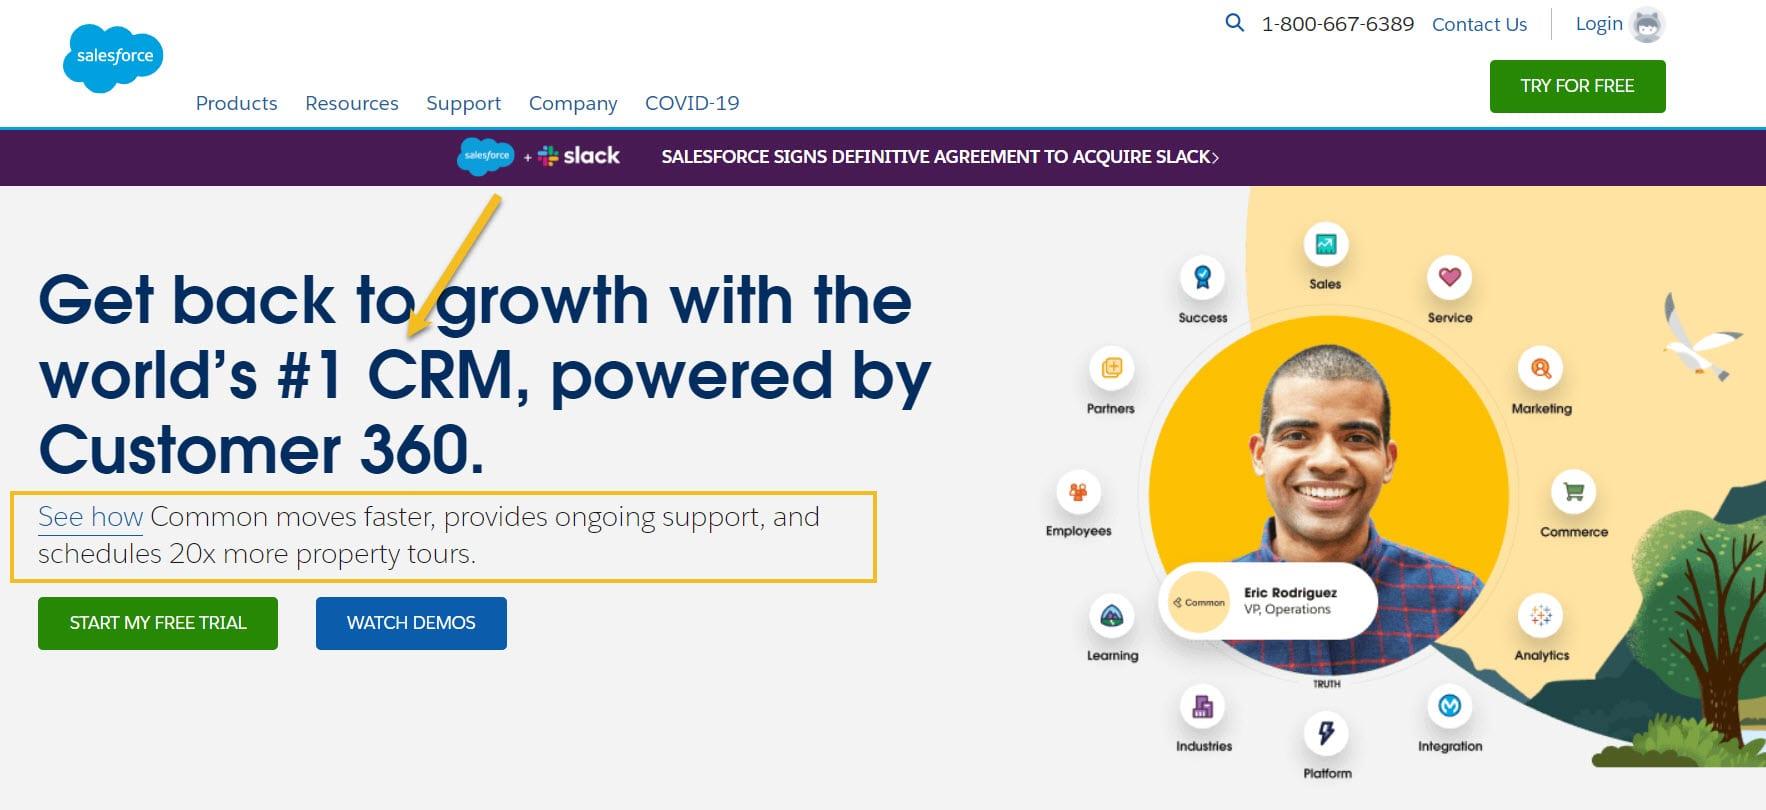 Salesforce inspiring trust from the website header